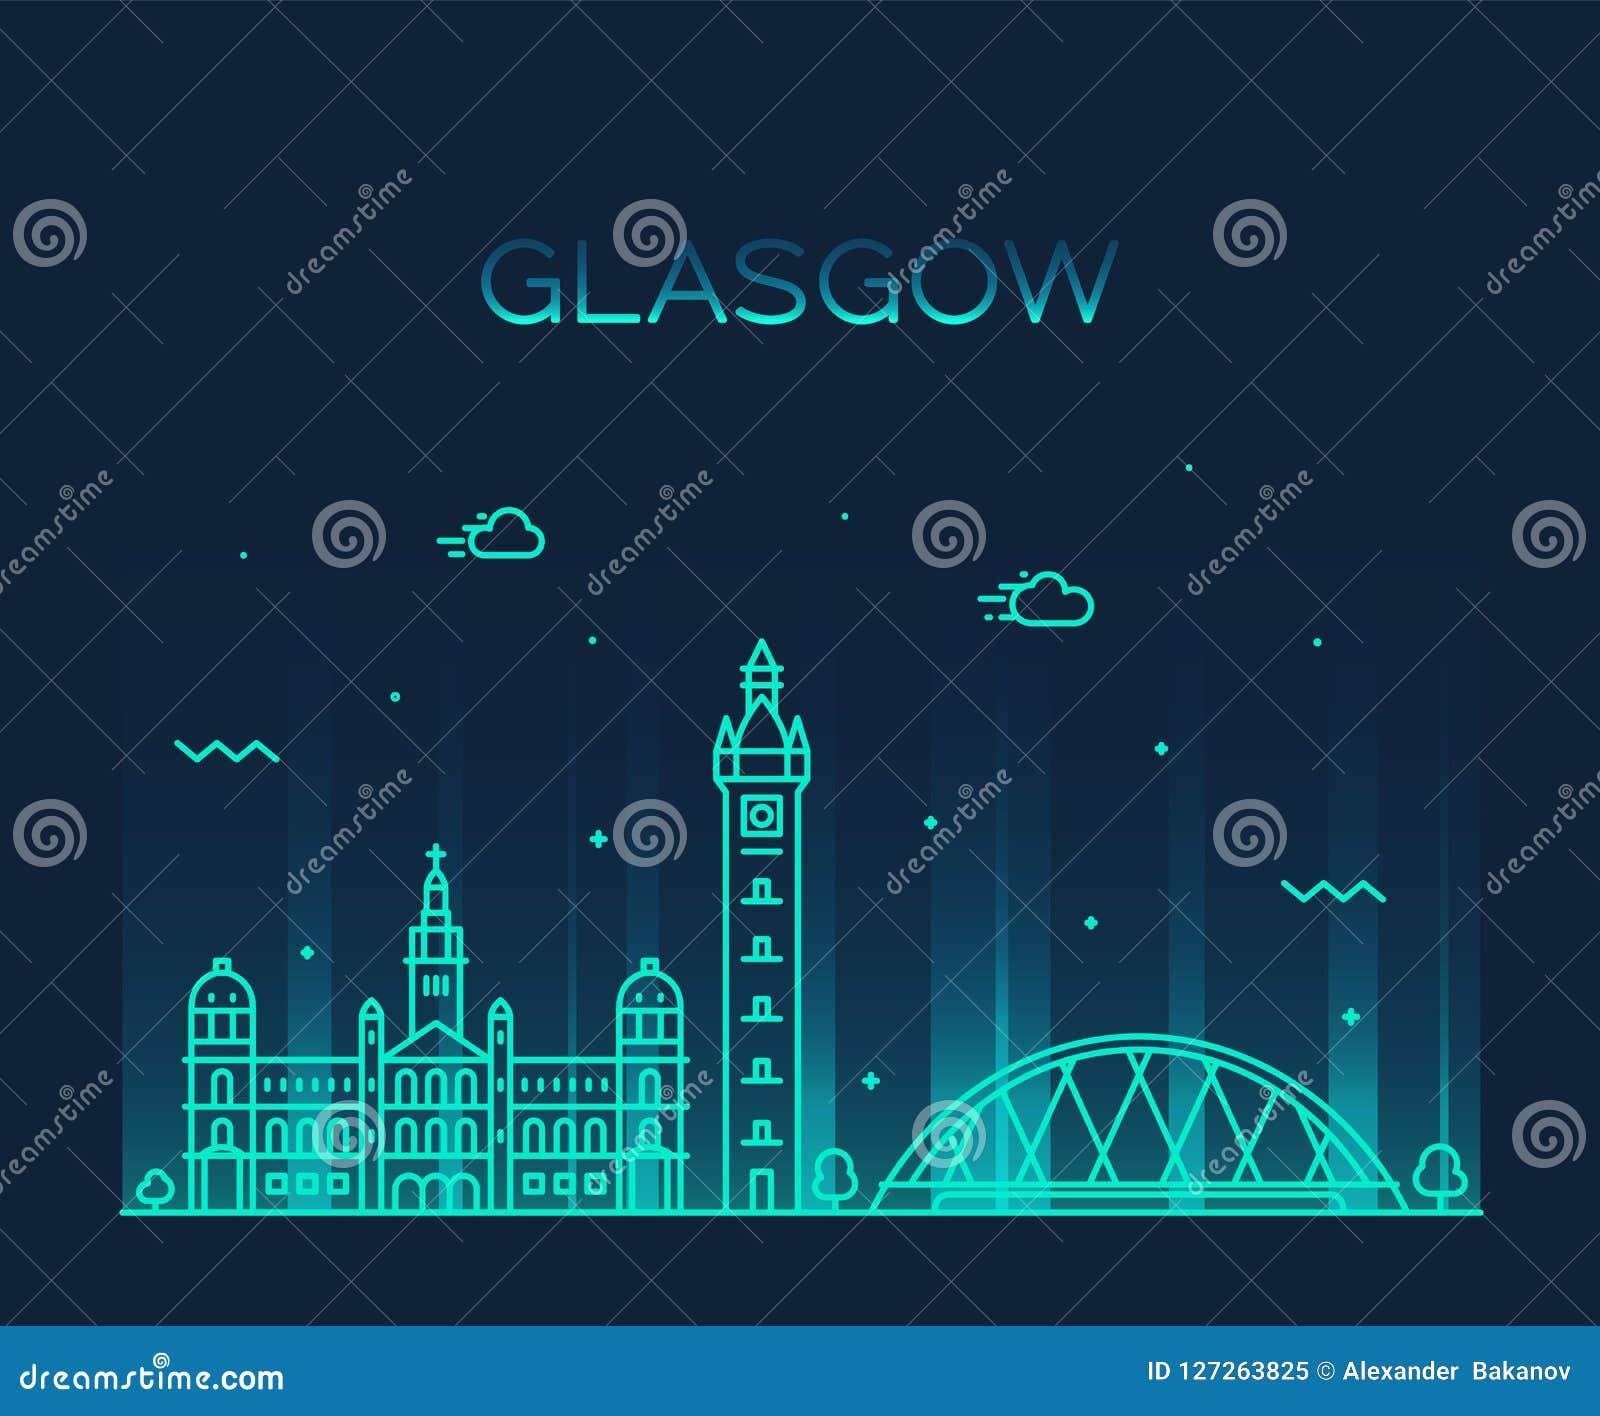 bc0e60736f16 Glasgow Skyline Scotland Trendy Vector Line Style Stock Vector ...